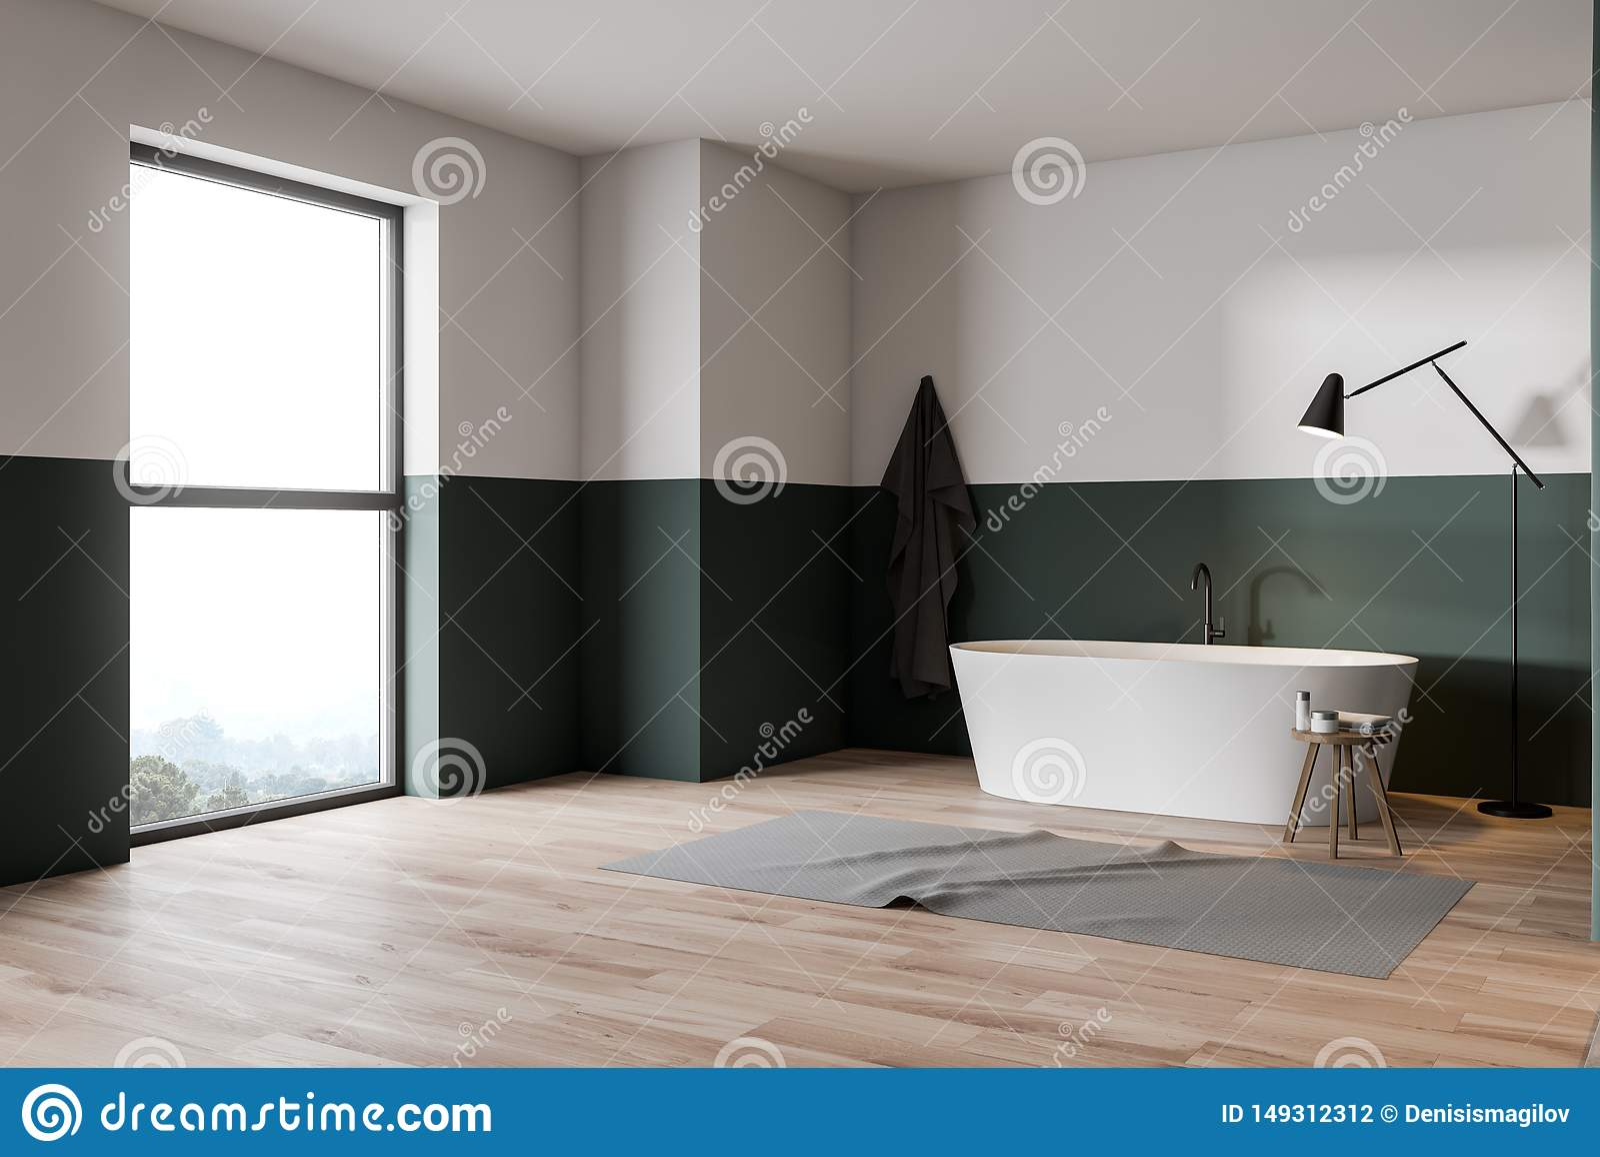 Green And White Bathroom Corner With Tub Stock Illustration Illustration Of Design Large 149312312